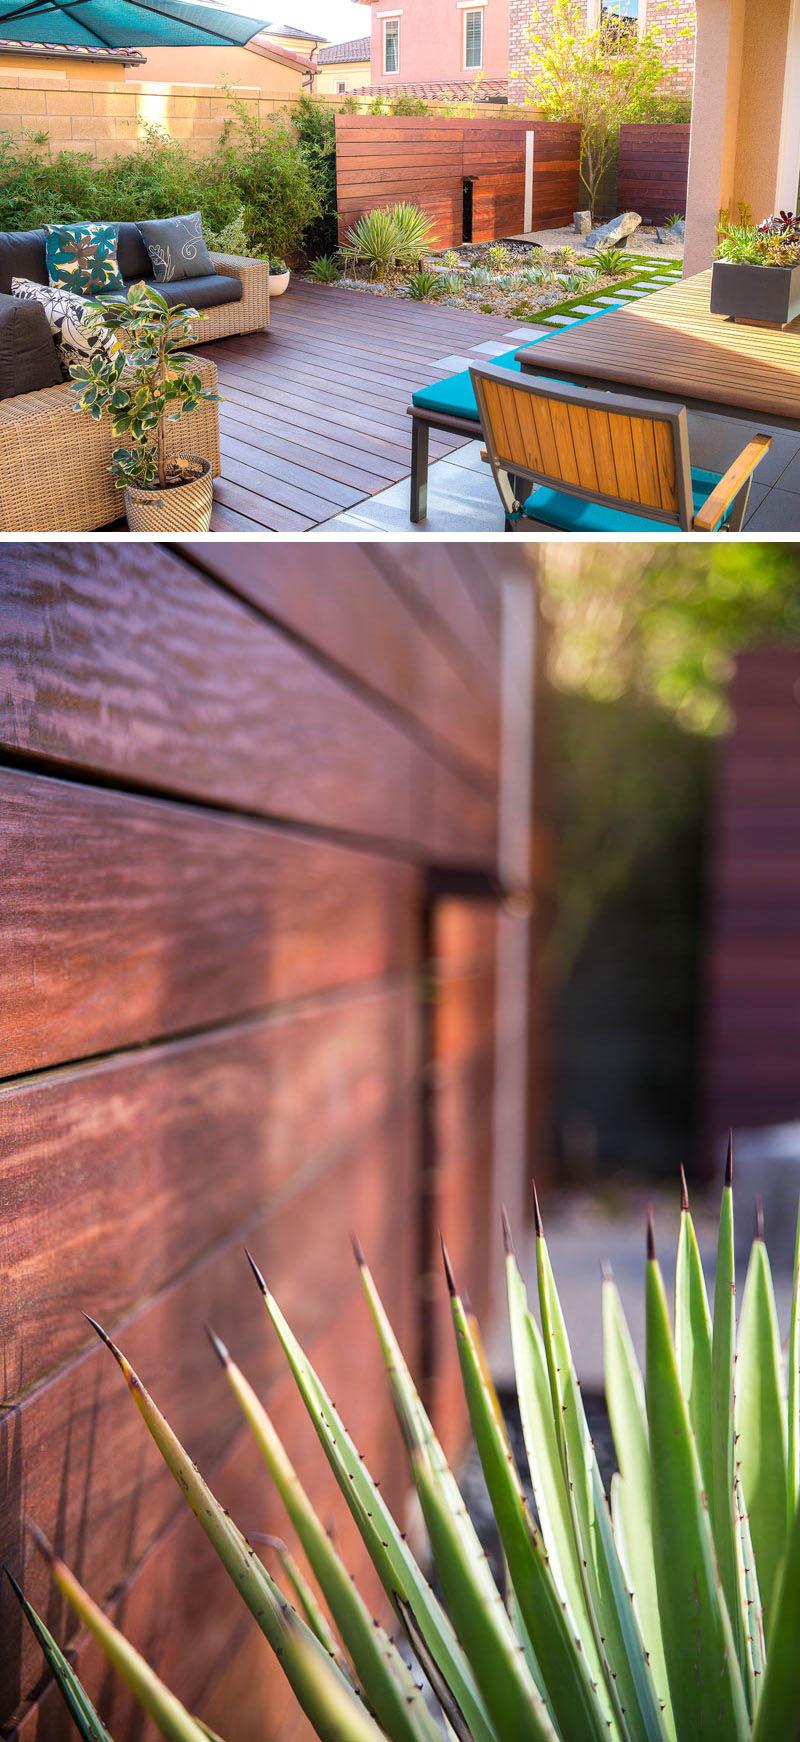 8 Elements To Include When Designing Your Zen Garden ... on Zen Backyard Ideas id=69804